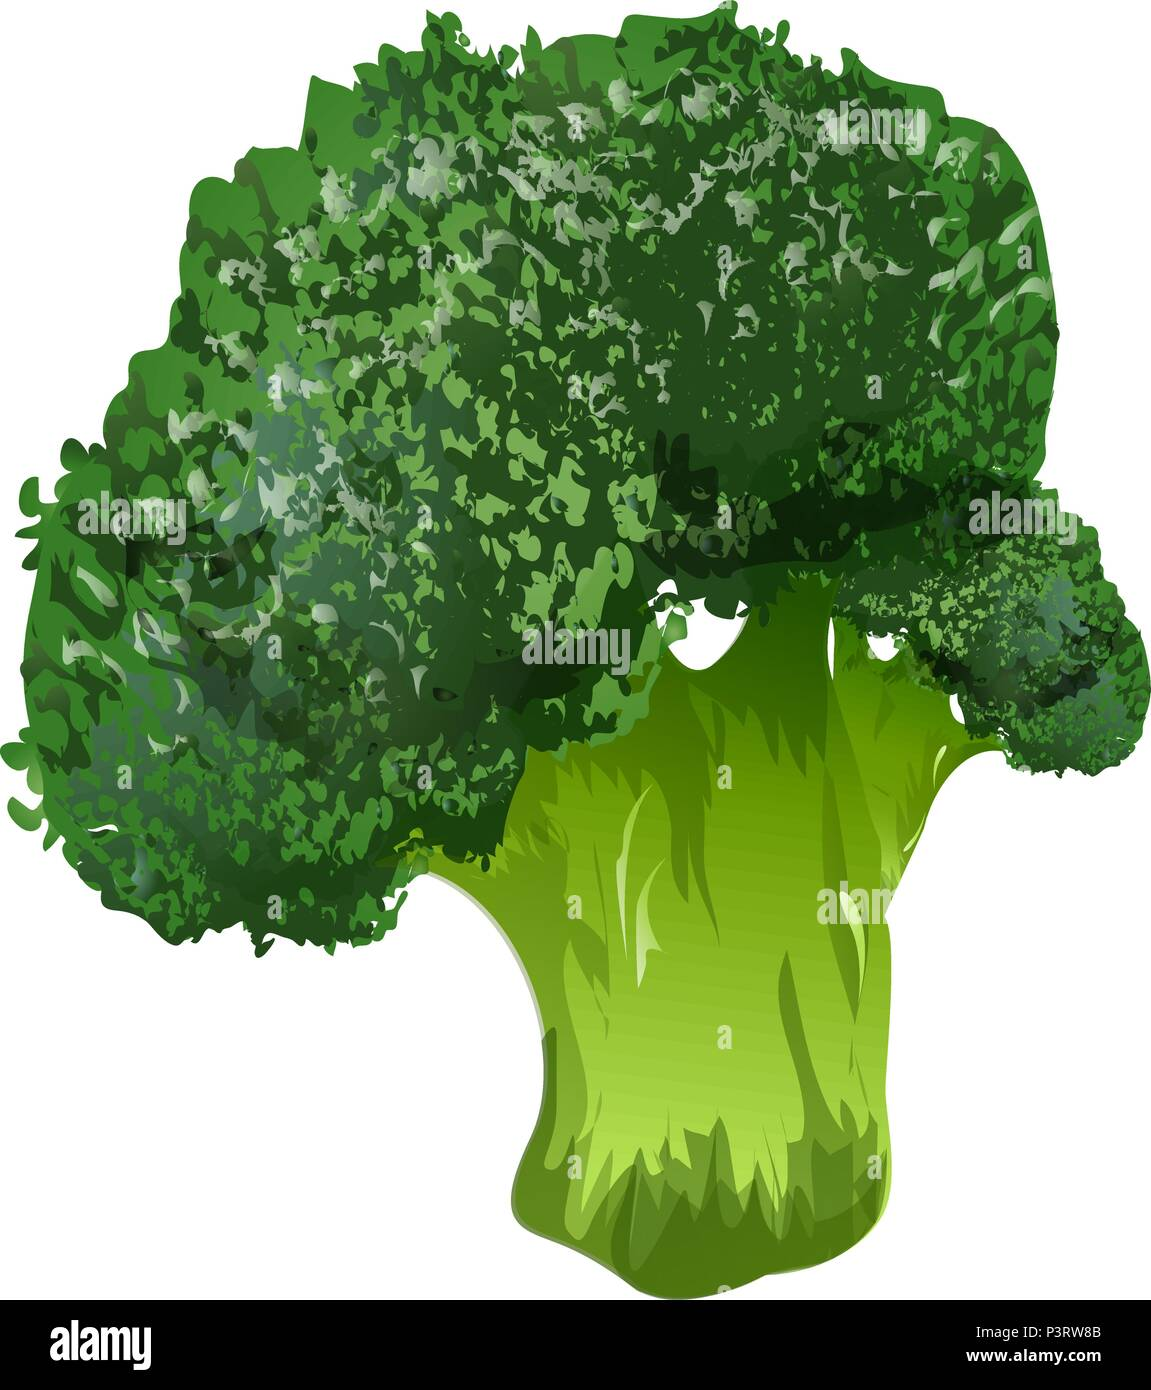 broccoli vector 3d illustration stock vector image art alamy https www alamy com broccoli vector 3d illustration image208893115 html